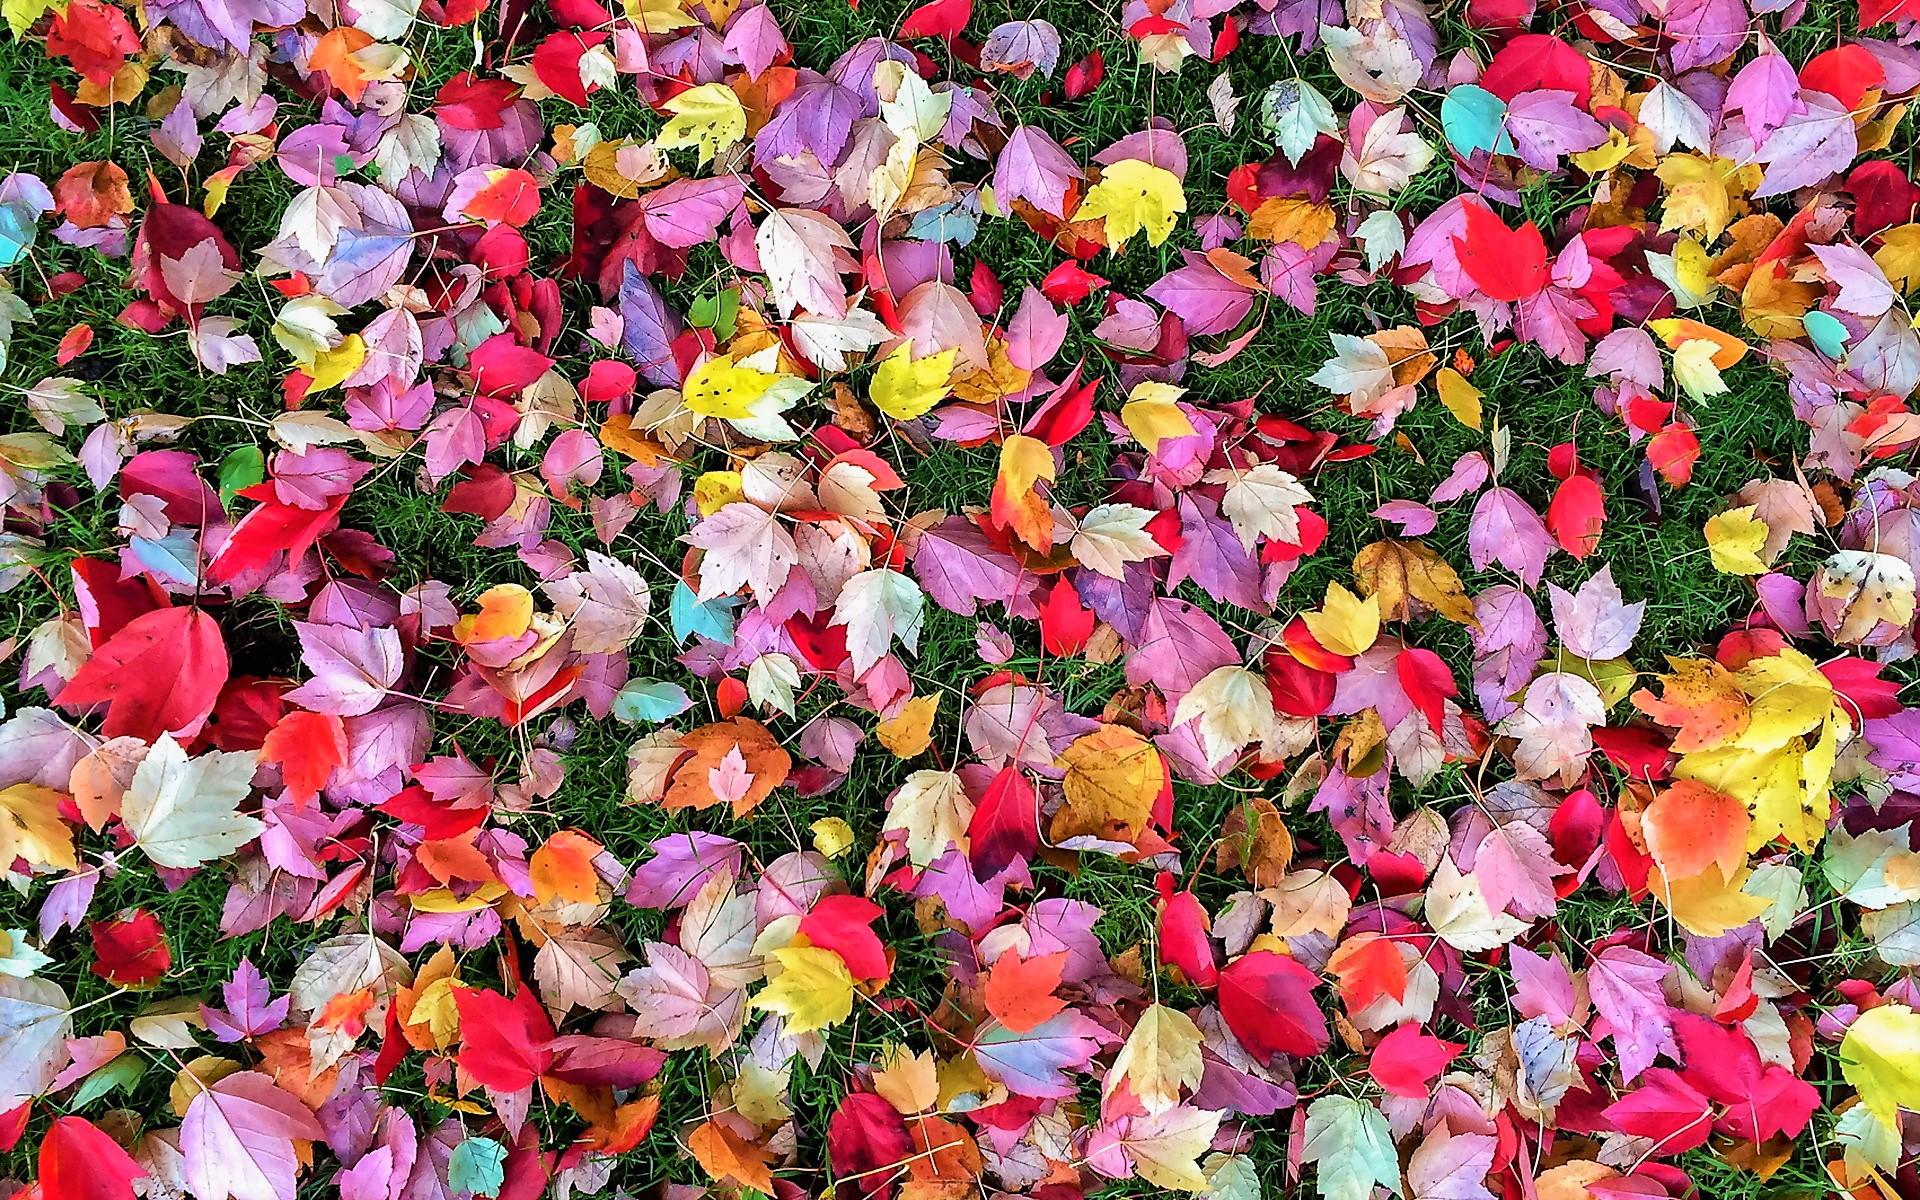 Colorful Autumn Leaves Fondo De Pantalla Hd Fondo De